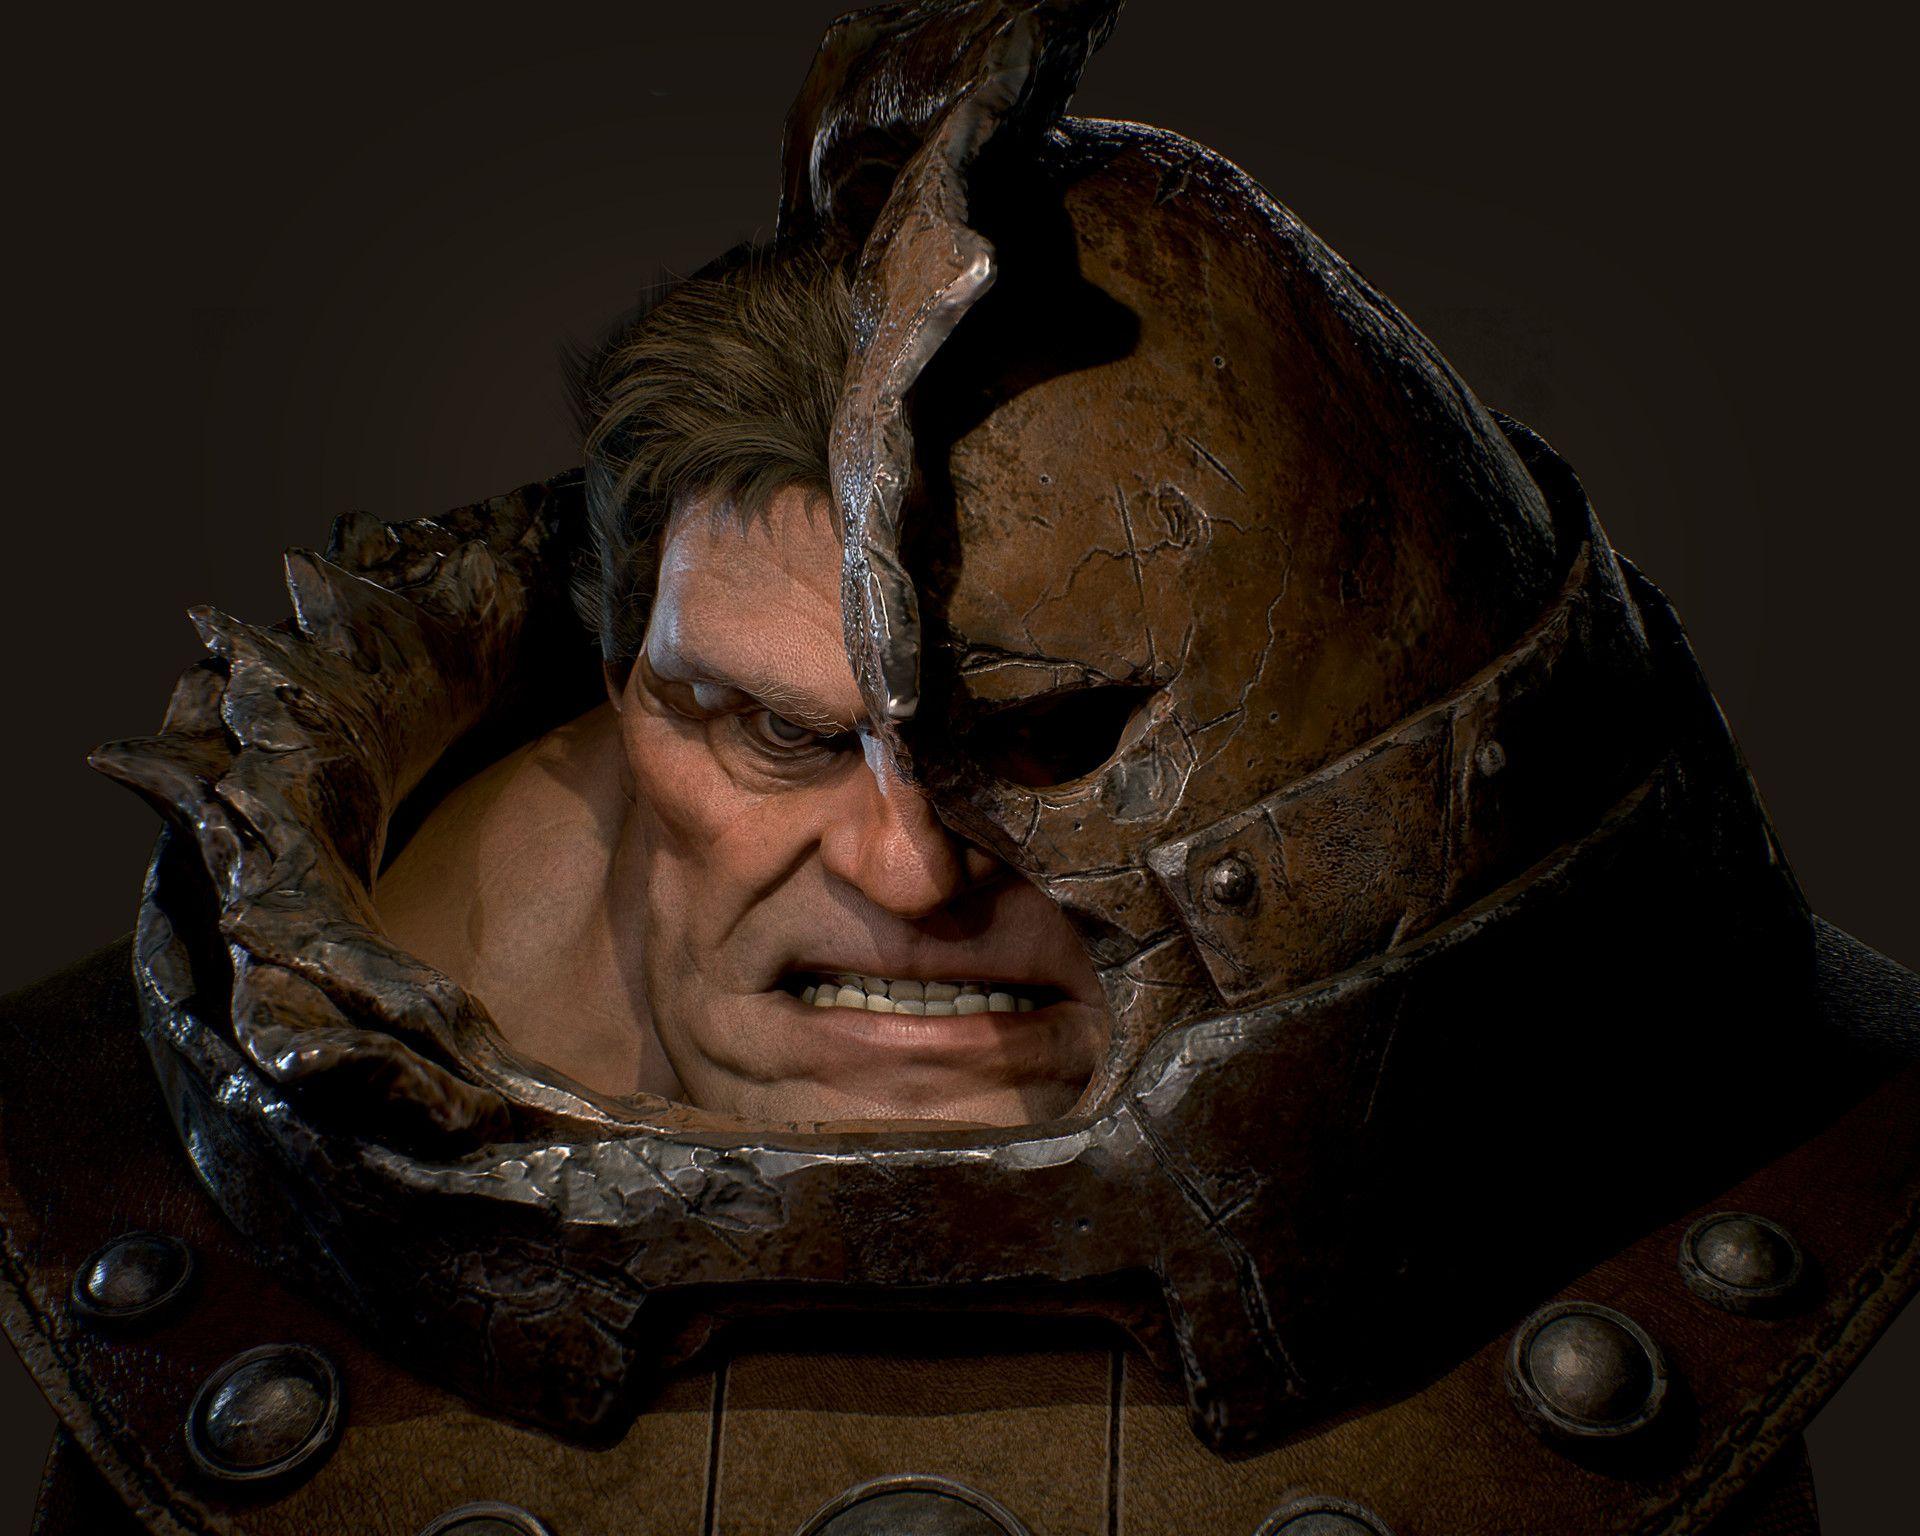 ArtStation - Damaged Juggernaut, Otavio Liborio | Marvel villains, Comic  face, Juggernaut marvel